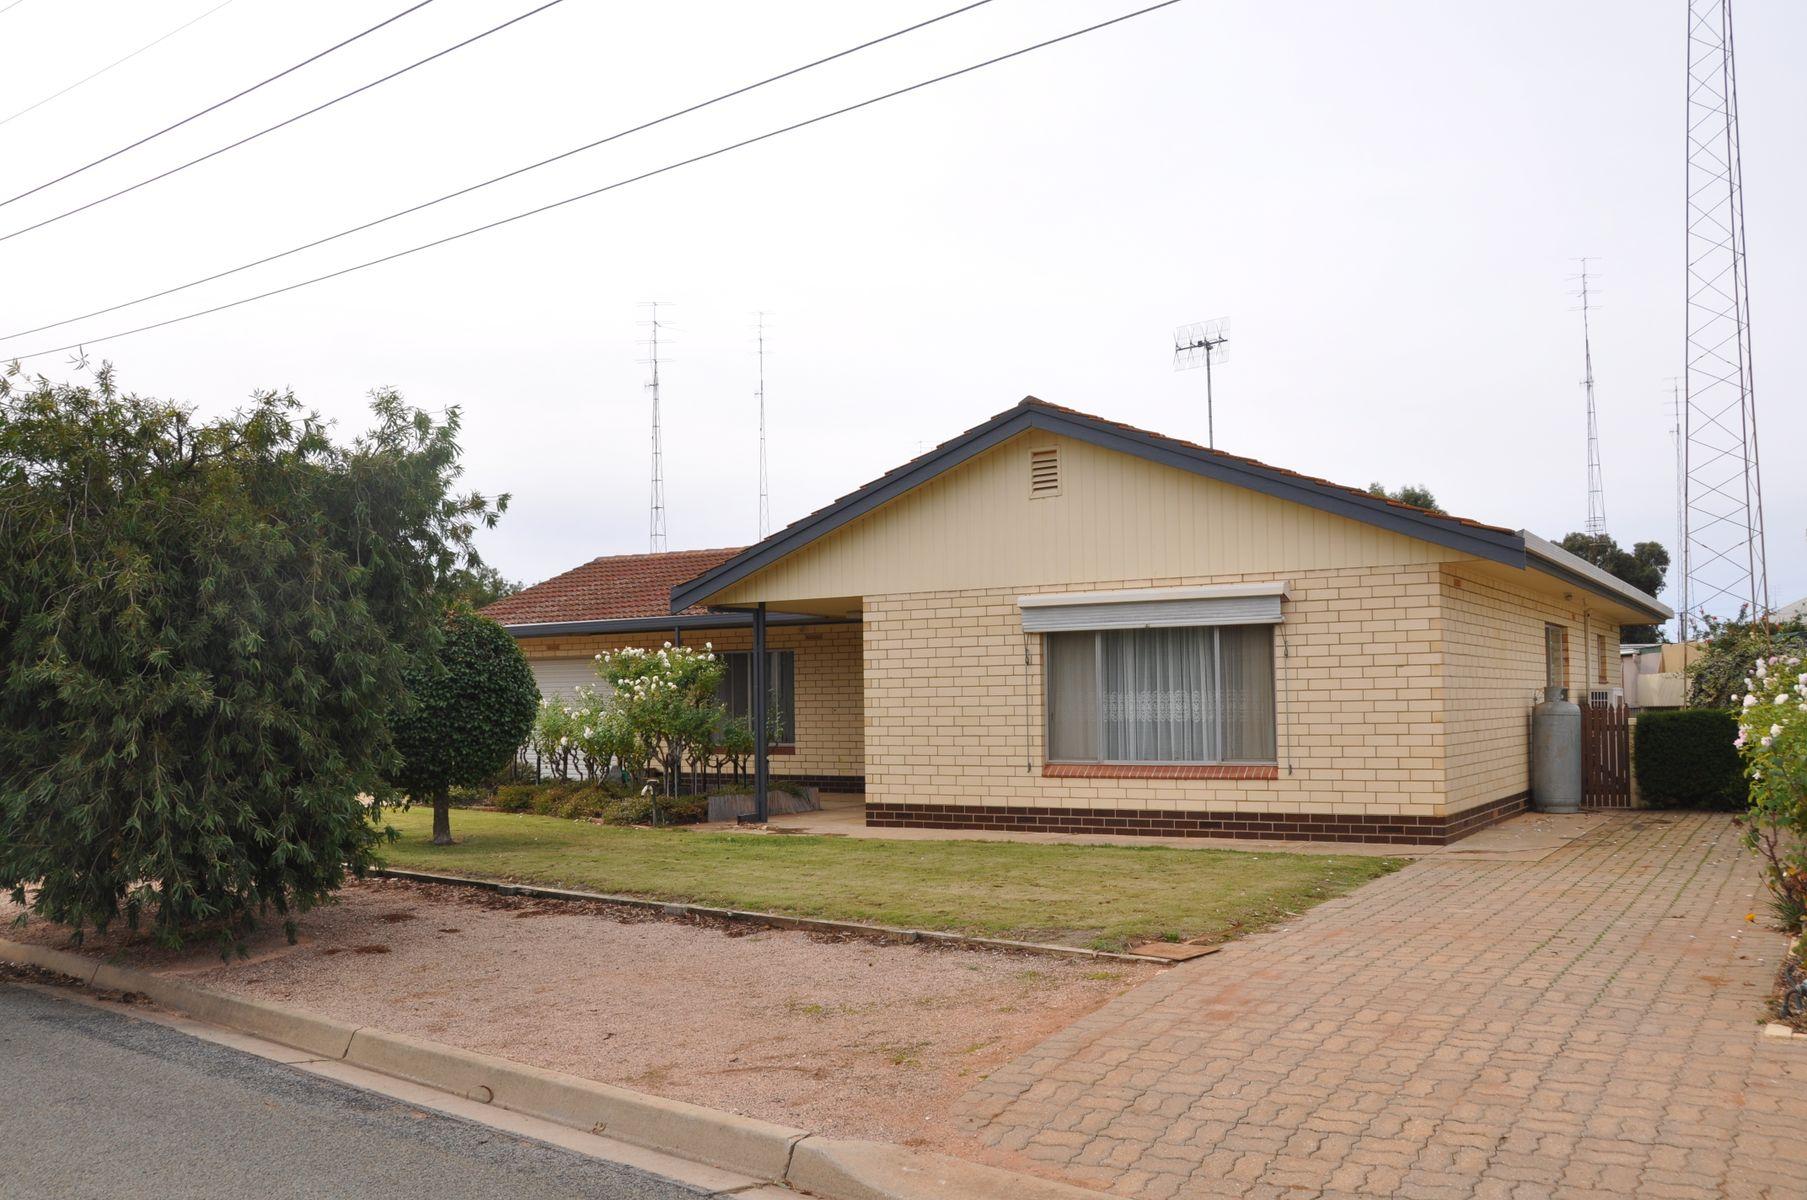 2 Heinemann Crescent, Waikerie, SA 5330